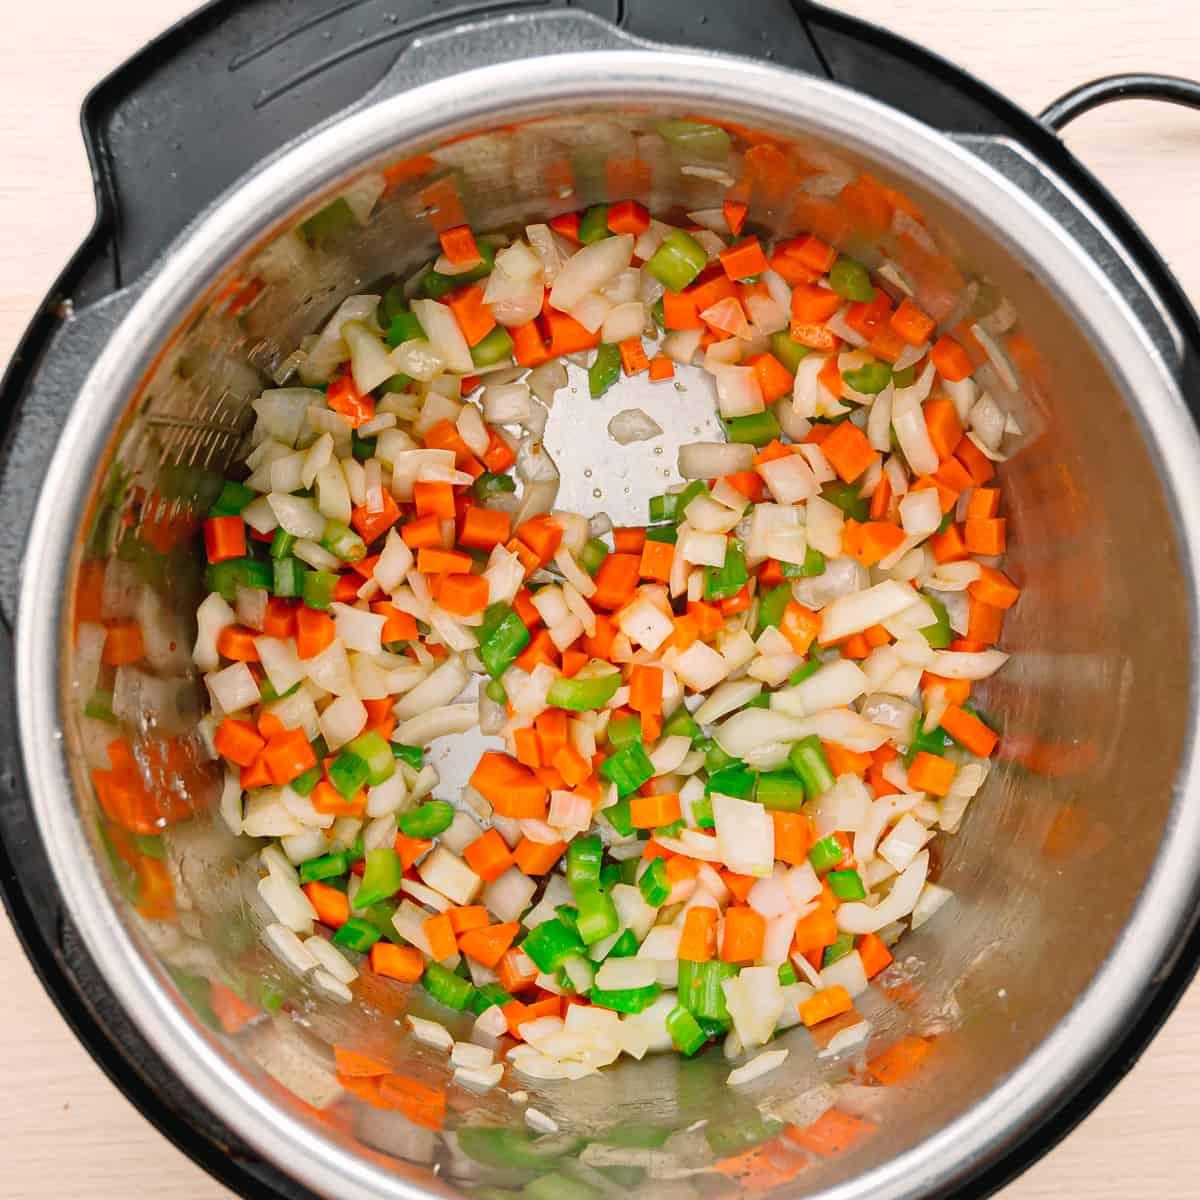 aromatic vegetables